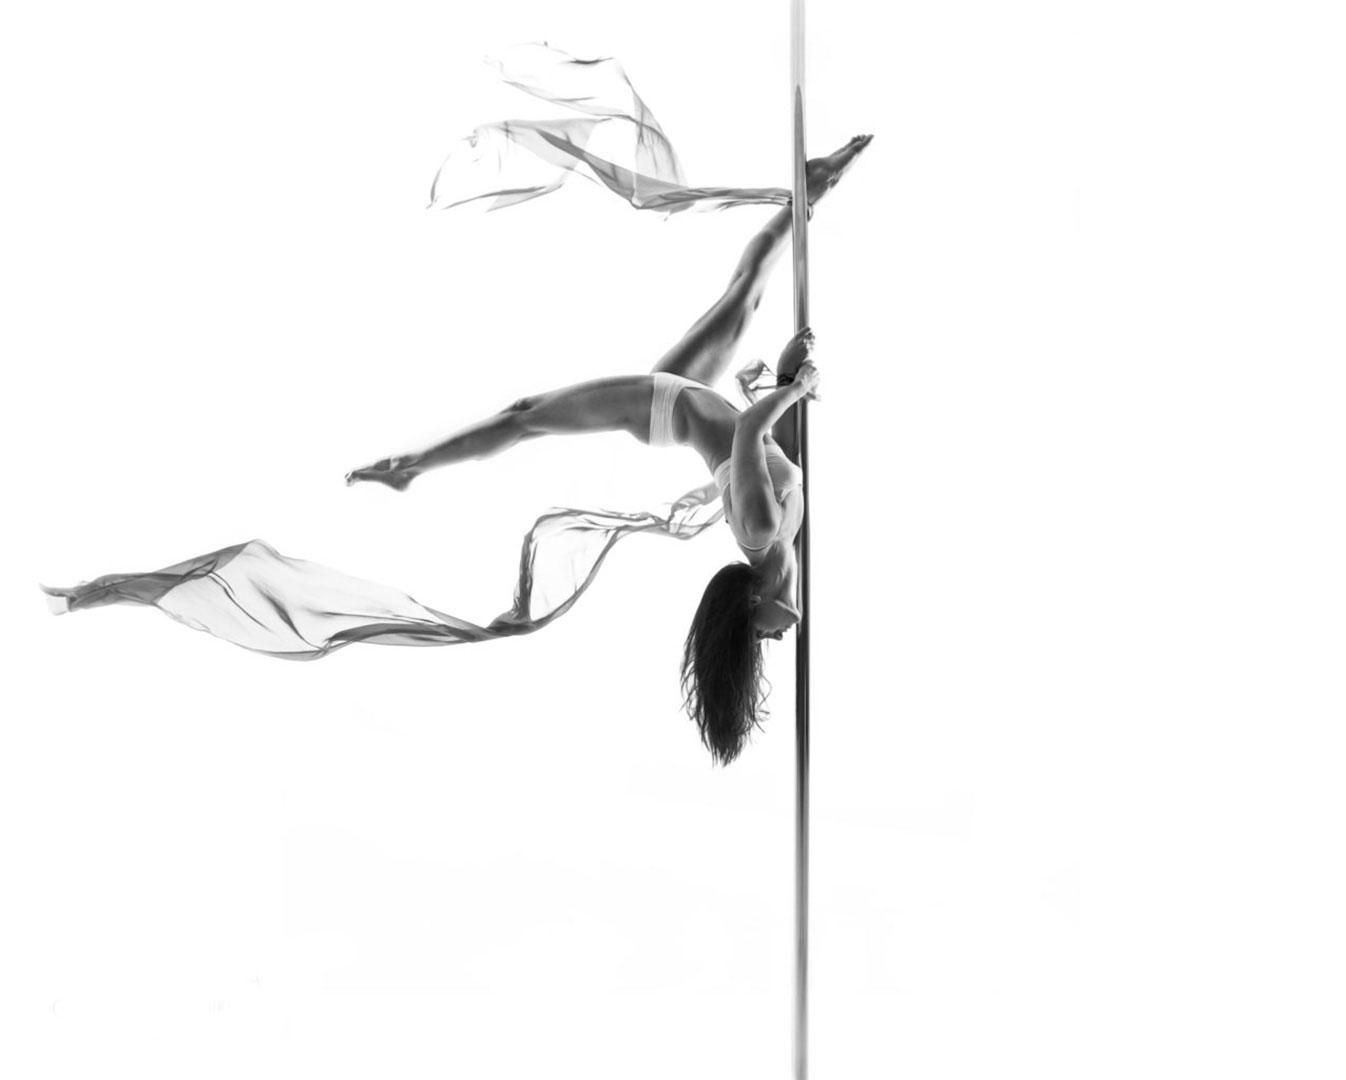 Pole Dance Destiny Pole-Dance-Destiny-slide-mobile